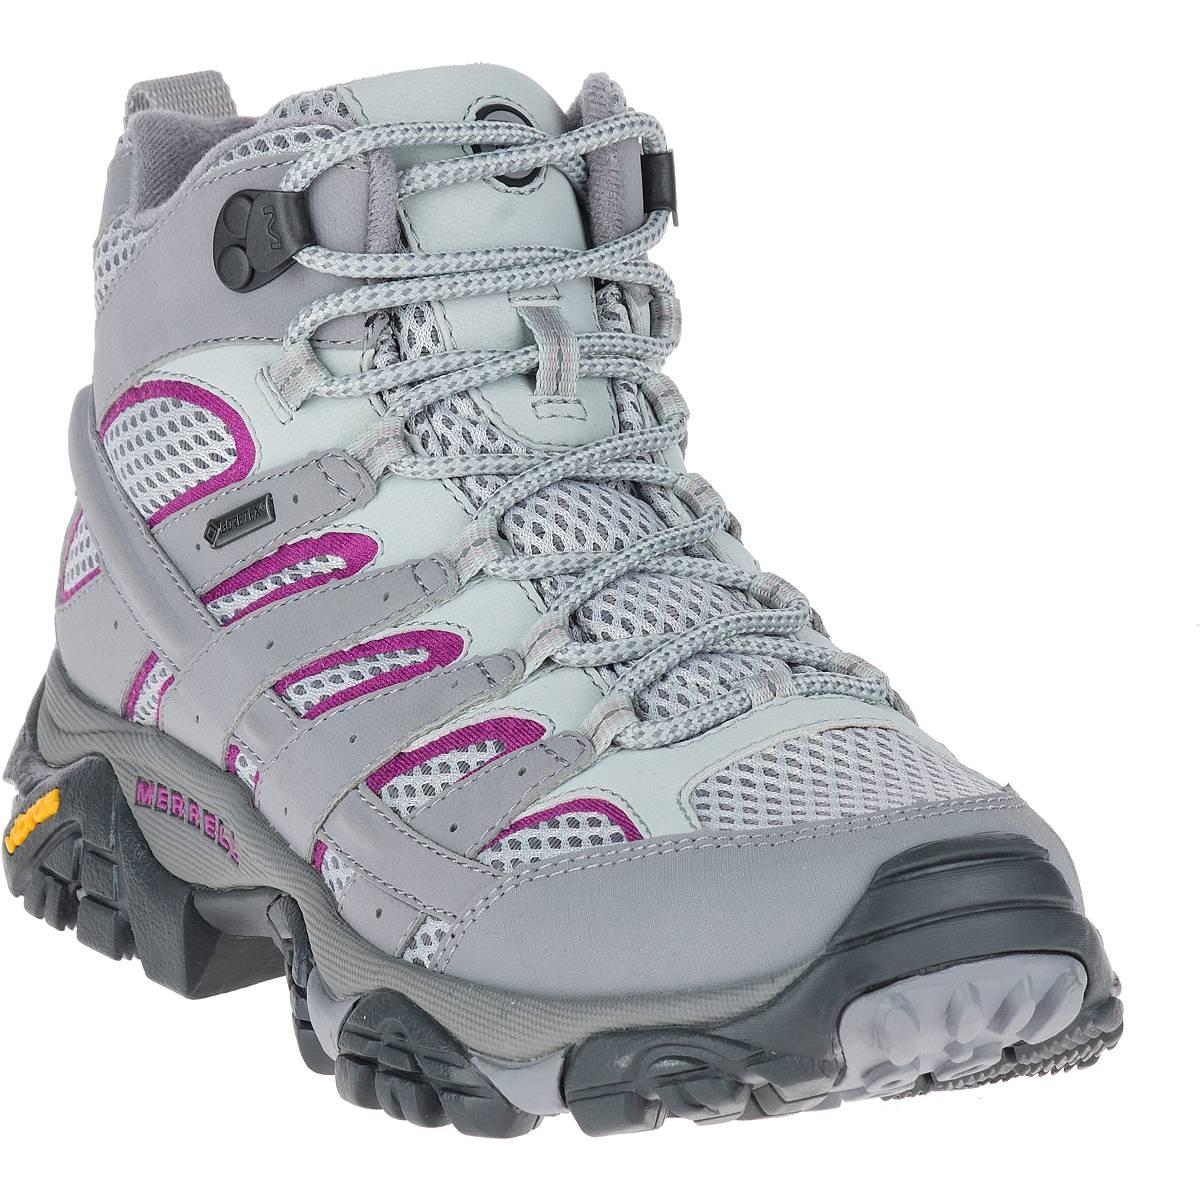 dd3851f4c1a Merrell Moab 2 MID GTX Walking Boots (Women's) - Frost Grey